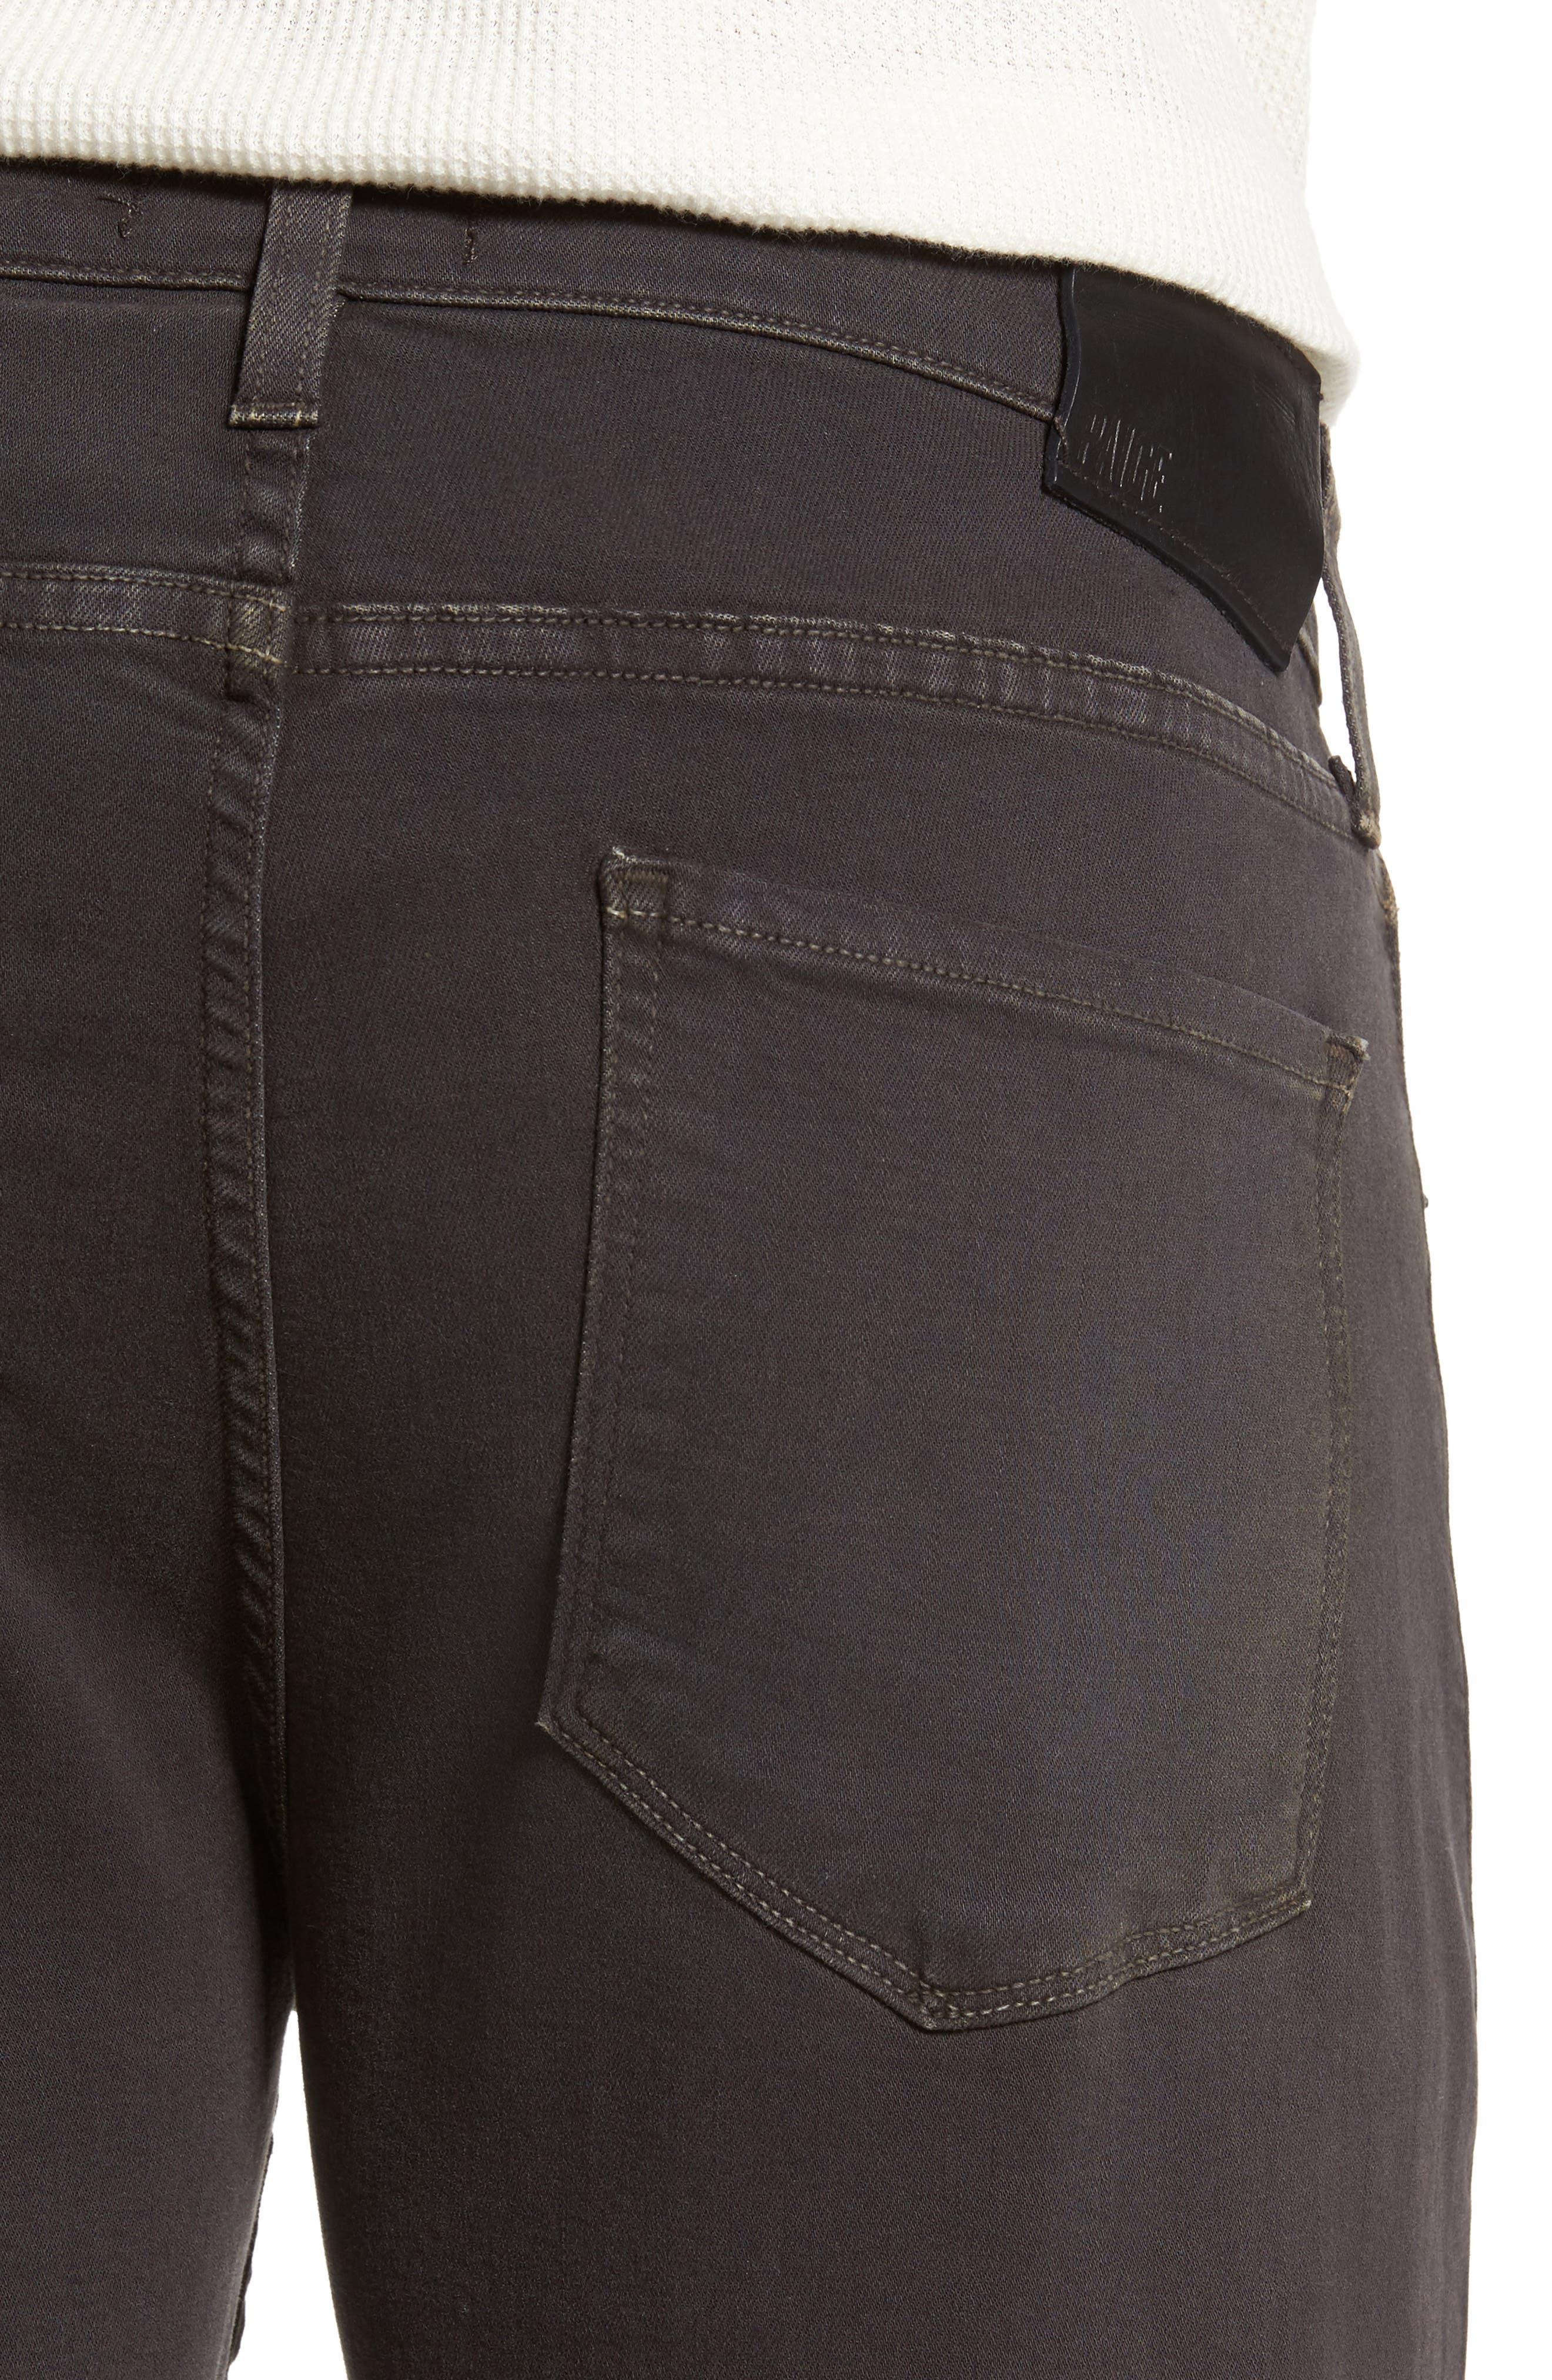 Transcend - Federal Slim Straight Leg Jeans,                             Alternate thumbnail 4, color,                             001